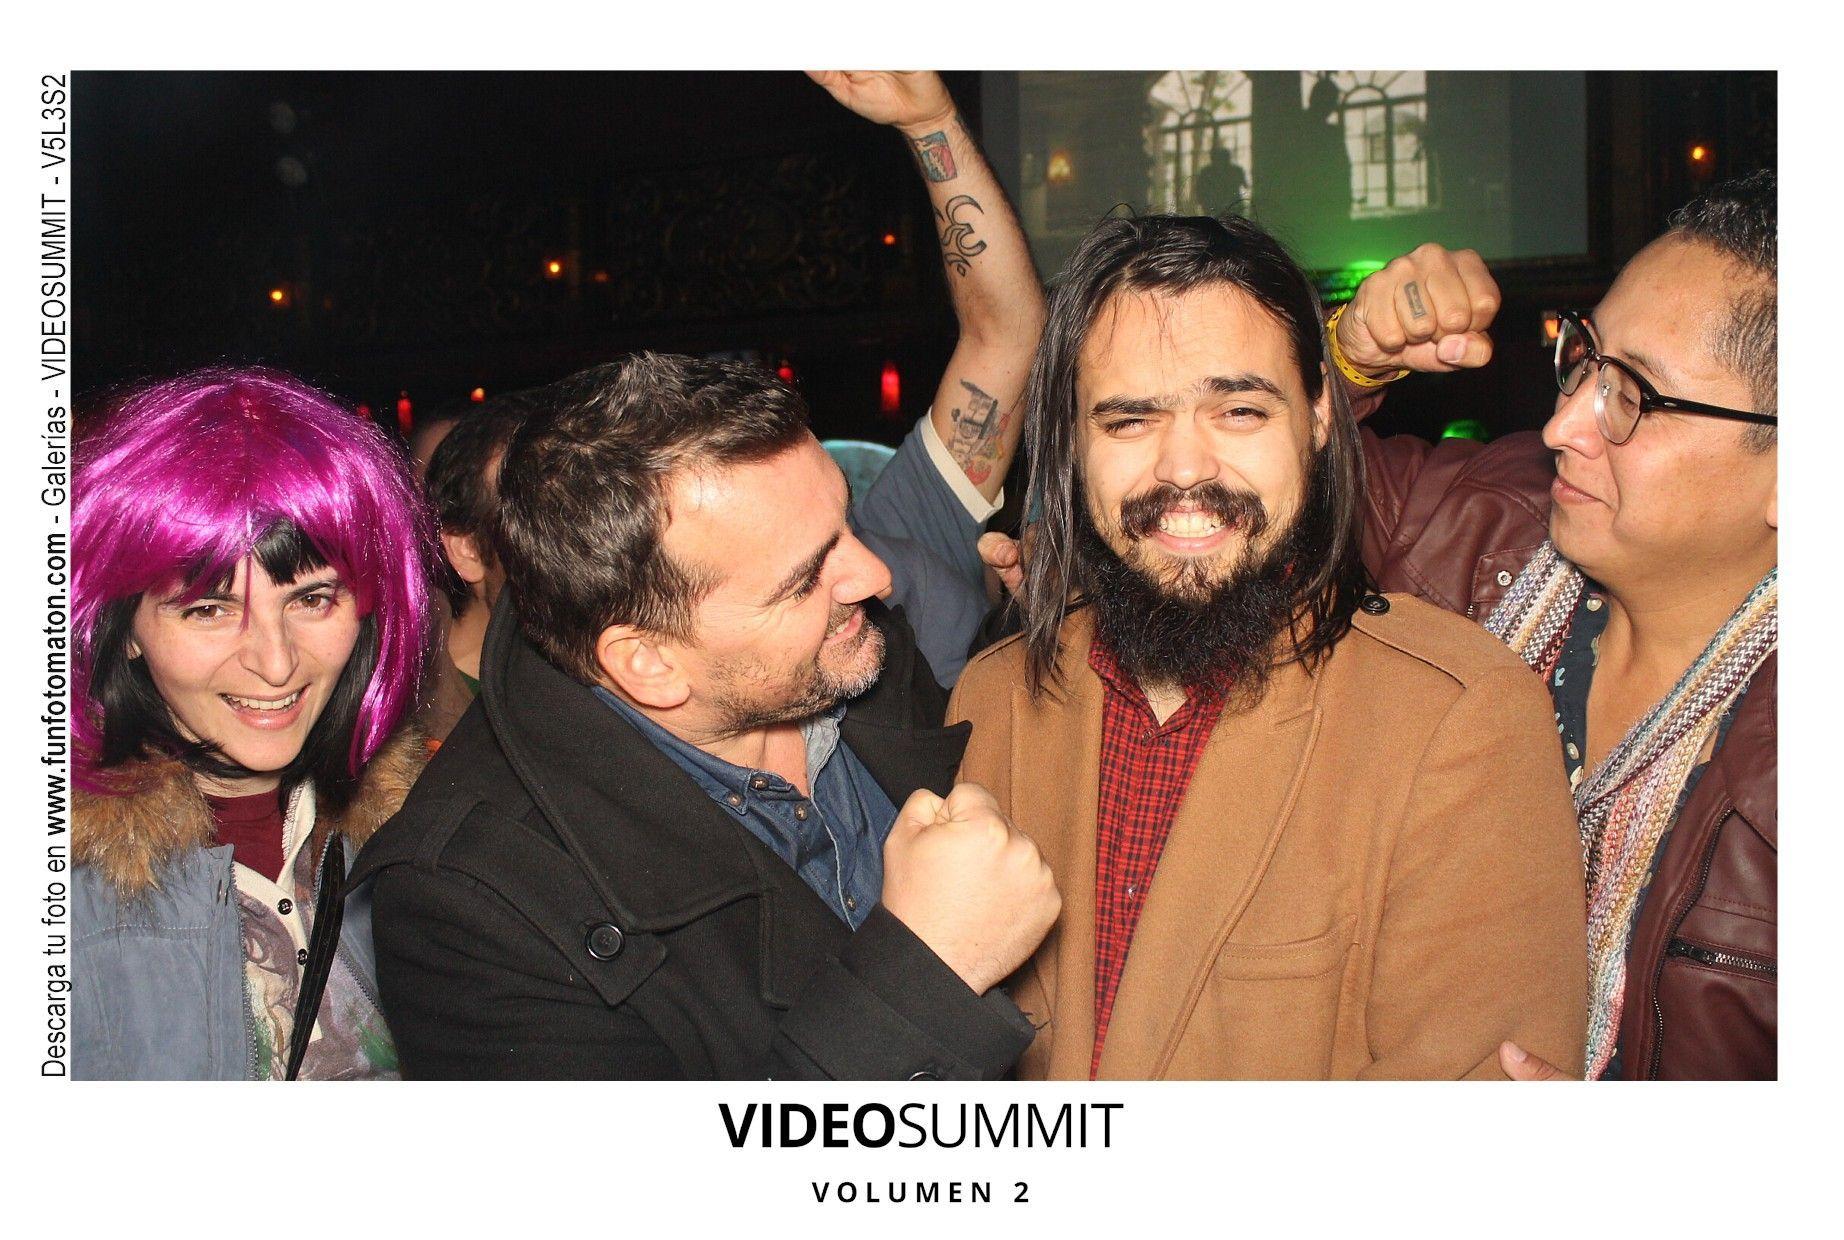 videosummit-vol2-club-party-021